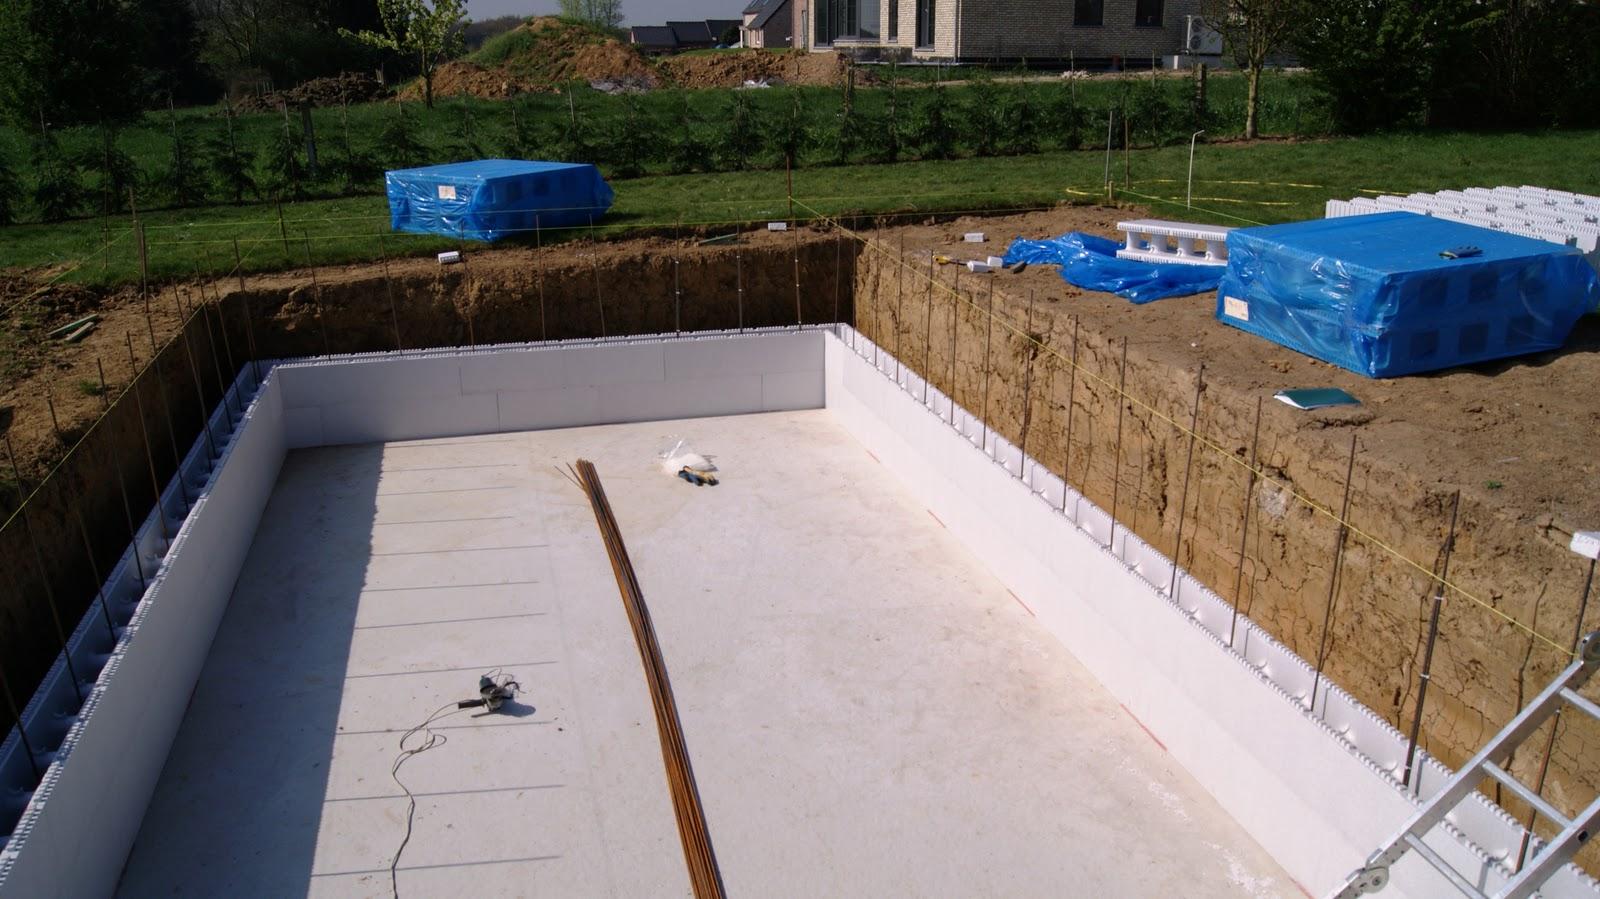 ma piscine en polystyr ne la pr paration des blocs et le. Black Bedroom Furniture Sets. Home Design Ideas